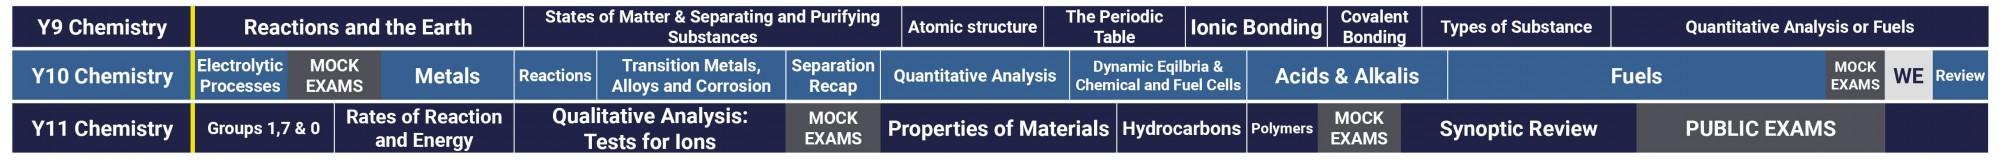 Science Curriculum 2021 2022 GCSE Chemistry